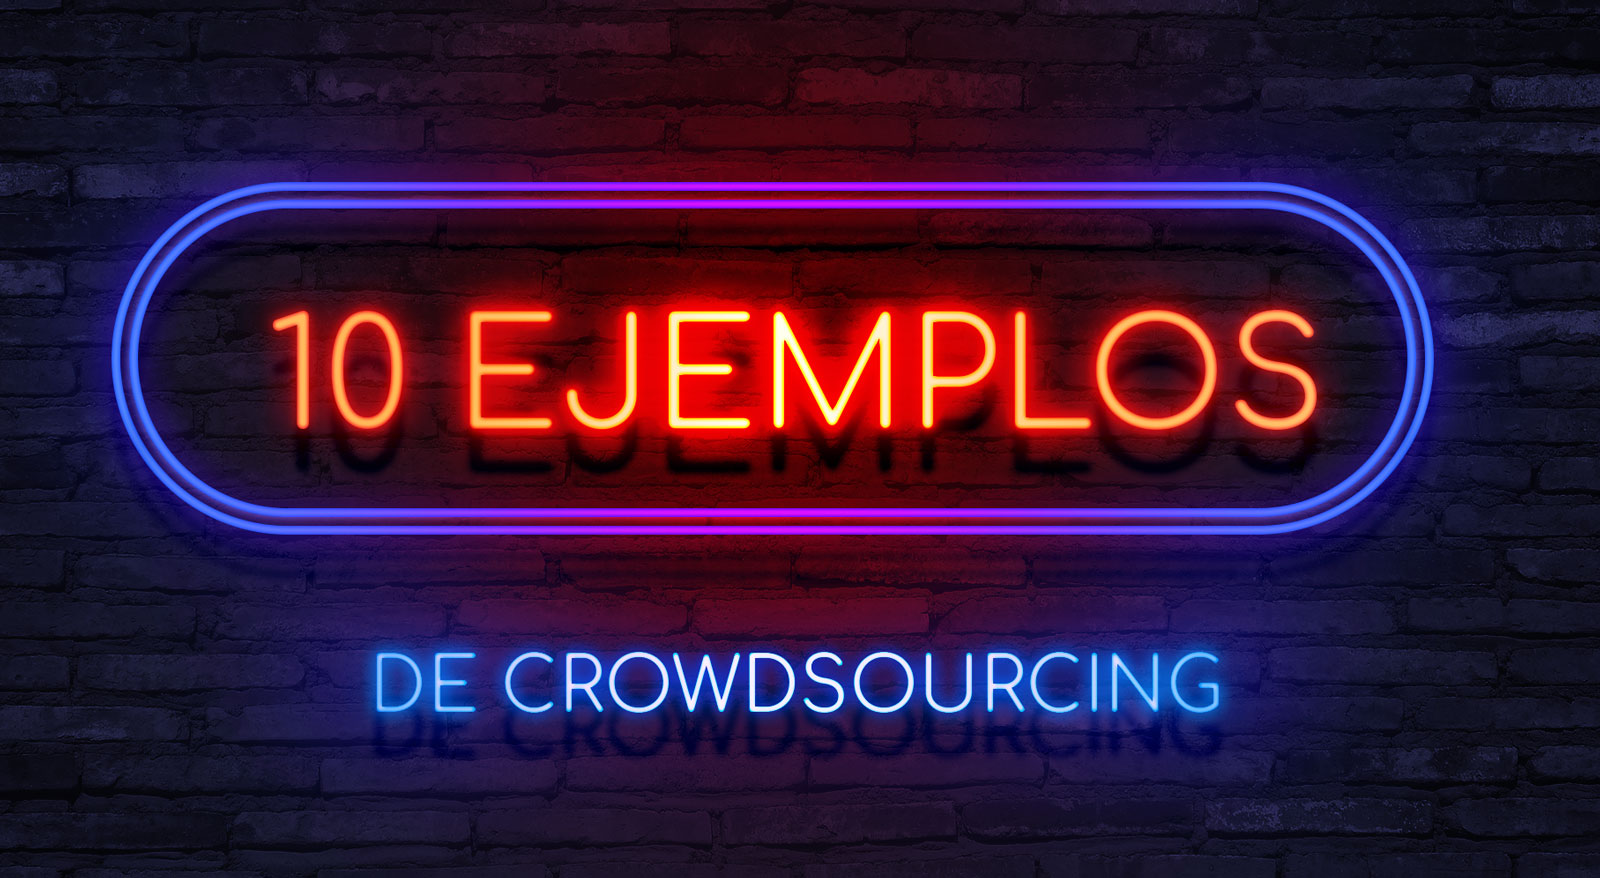 Ejemplos Crowdsourcing